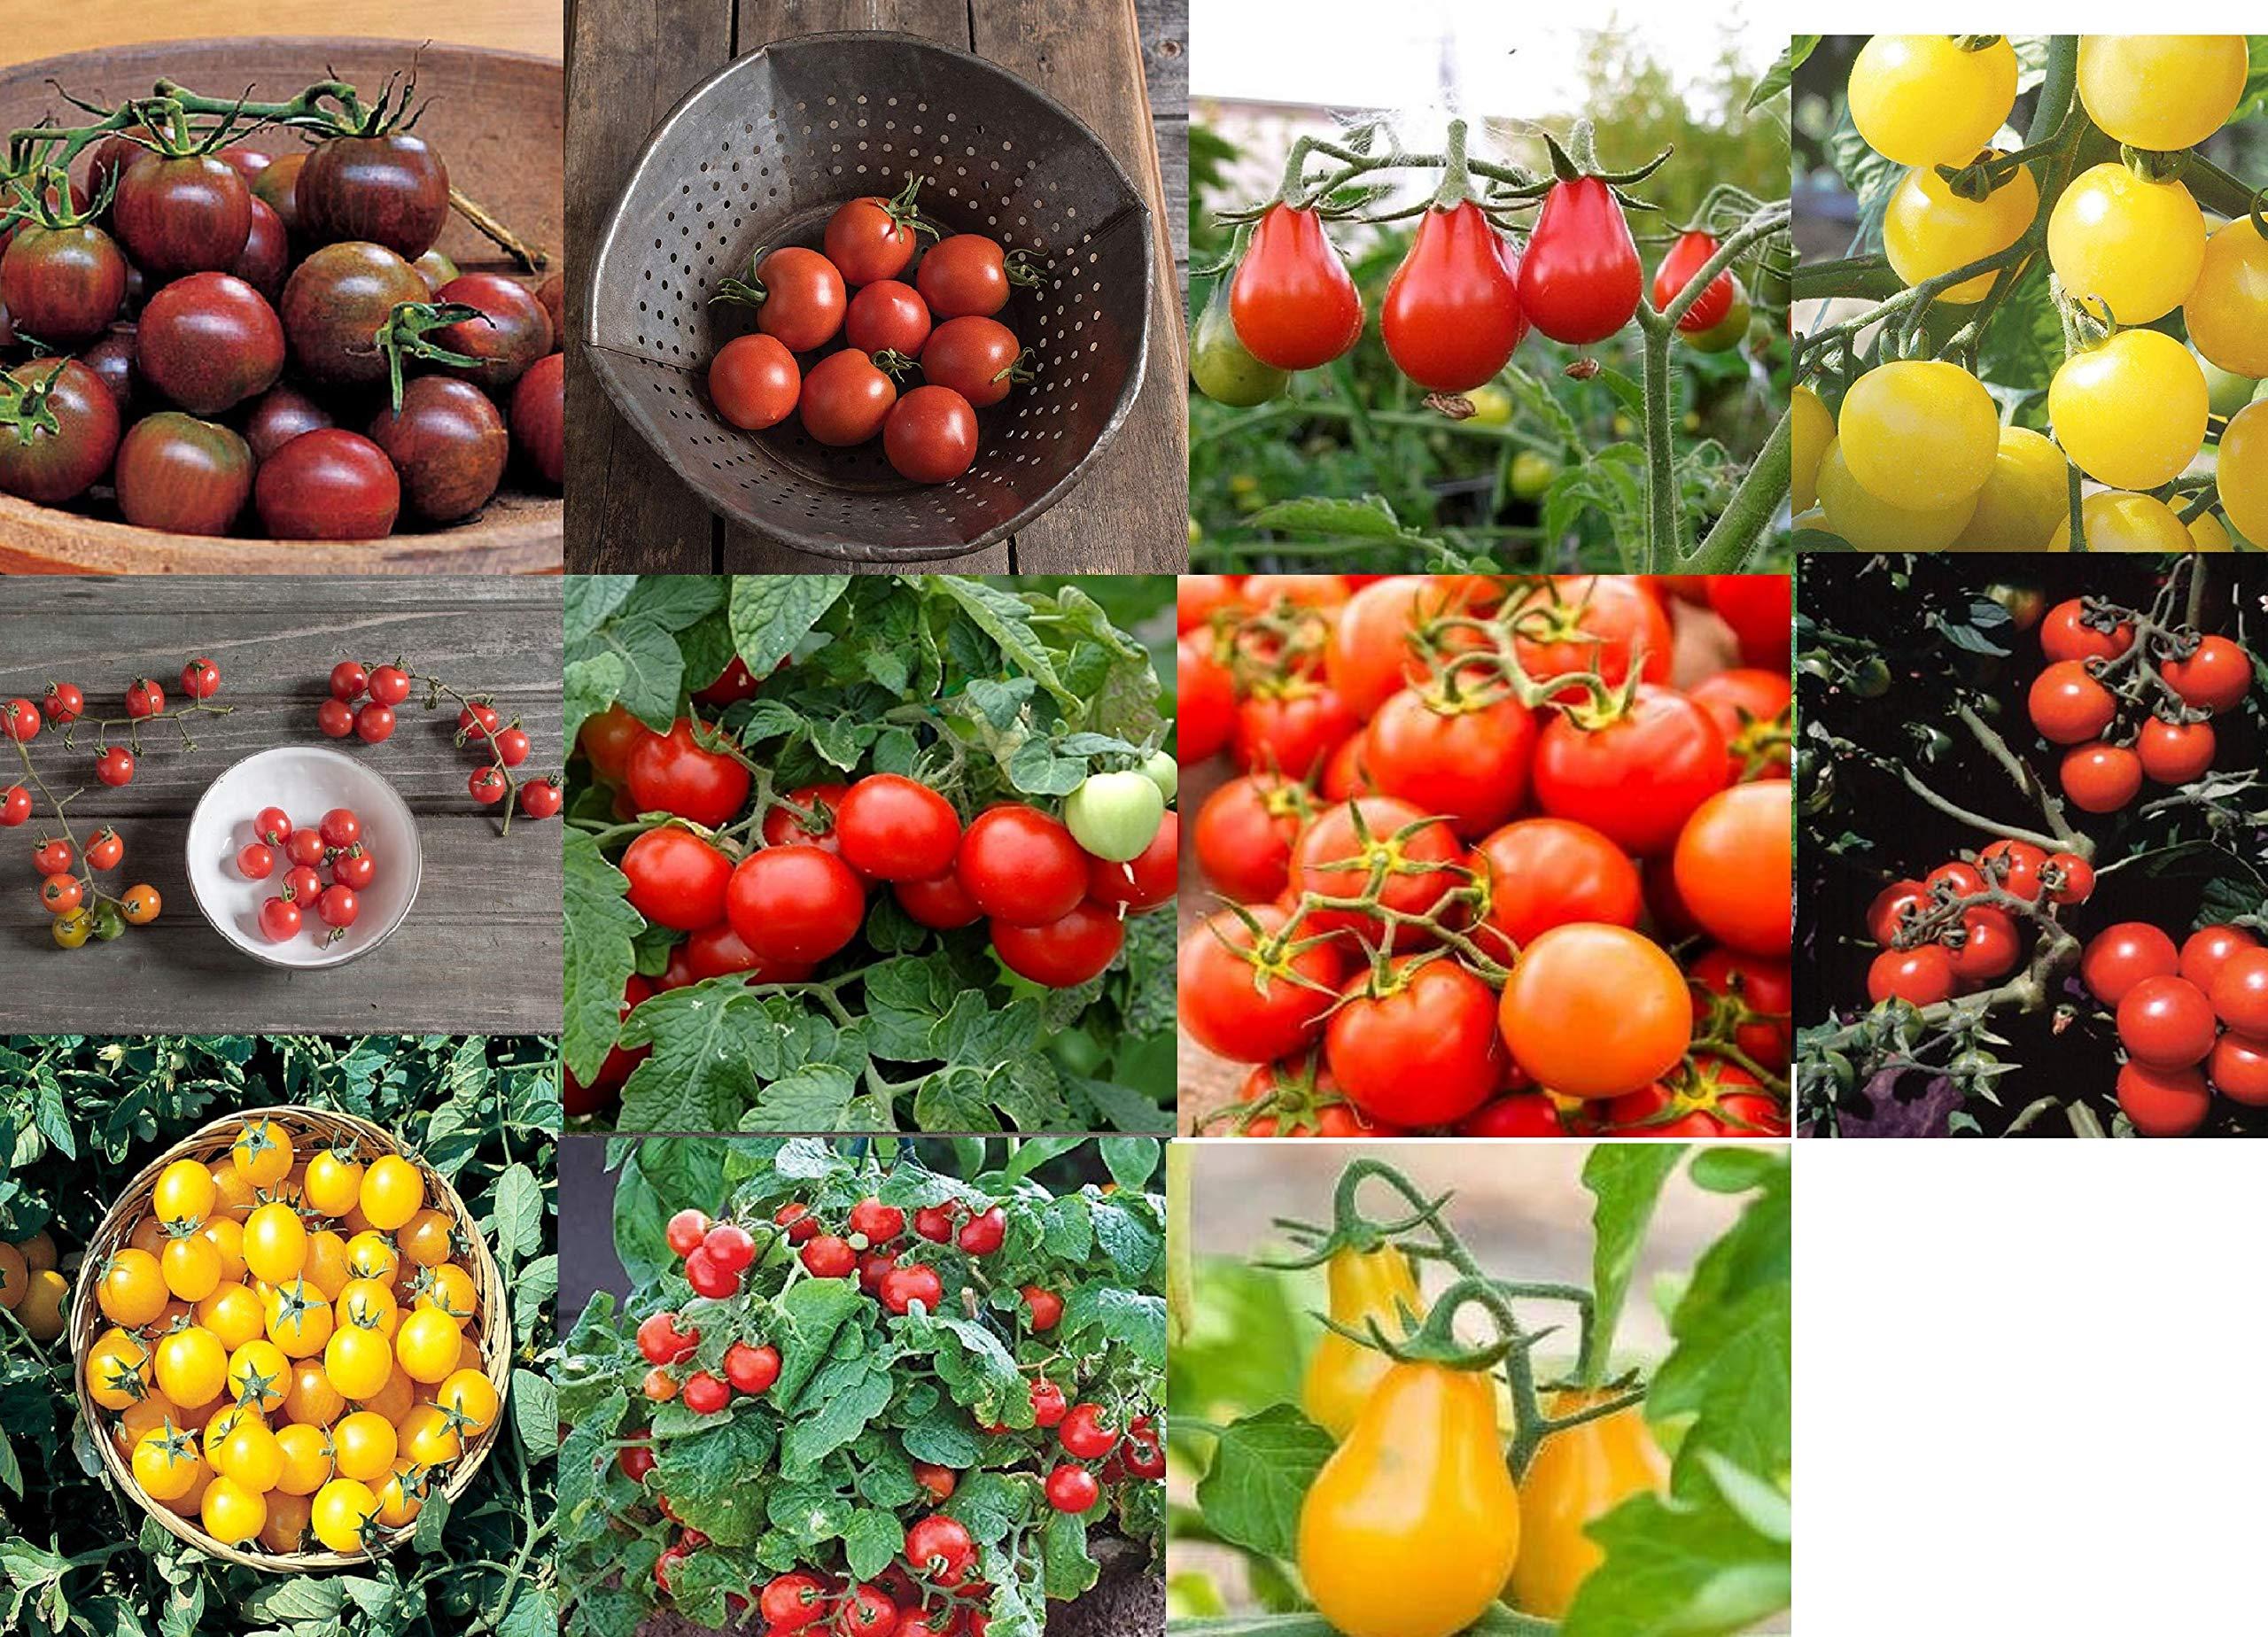 David's Garden Seeds Collection Set Tomato Cherry NEP933V (Multi) 11 Varieties 550 Seeds (Non-GMO, Open Pollinated, Heirloom, Organic)